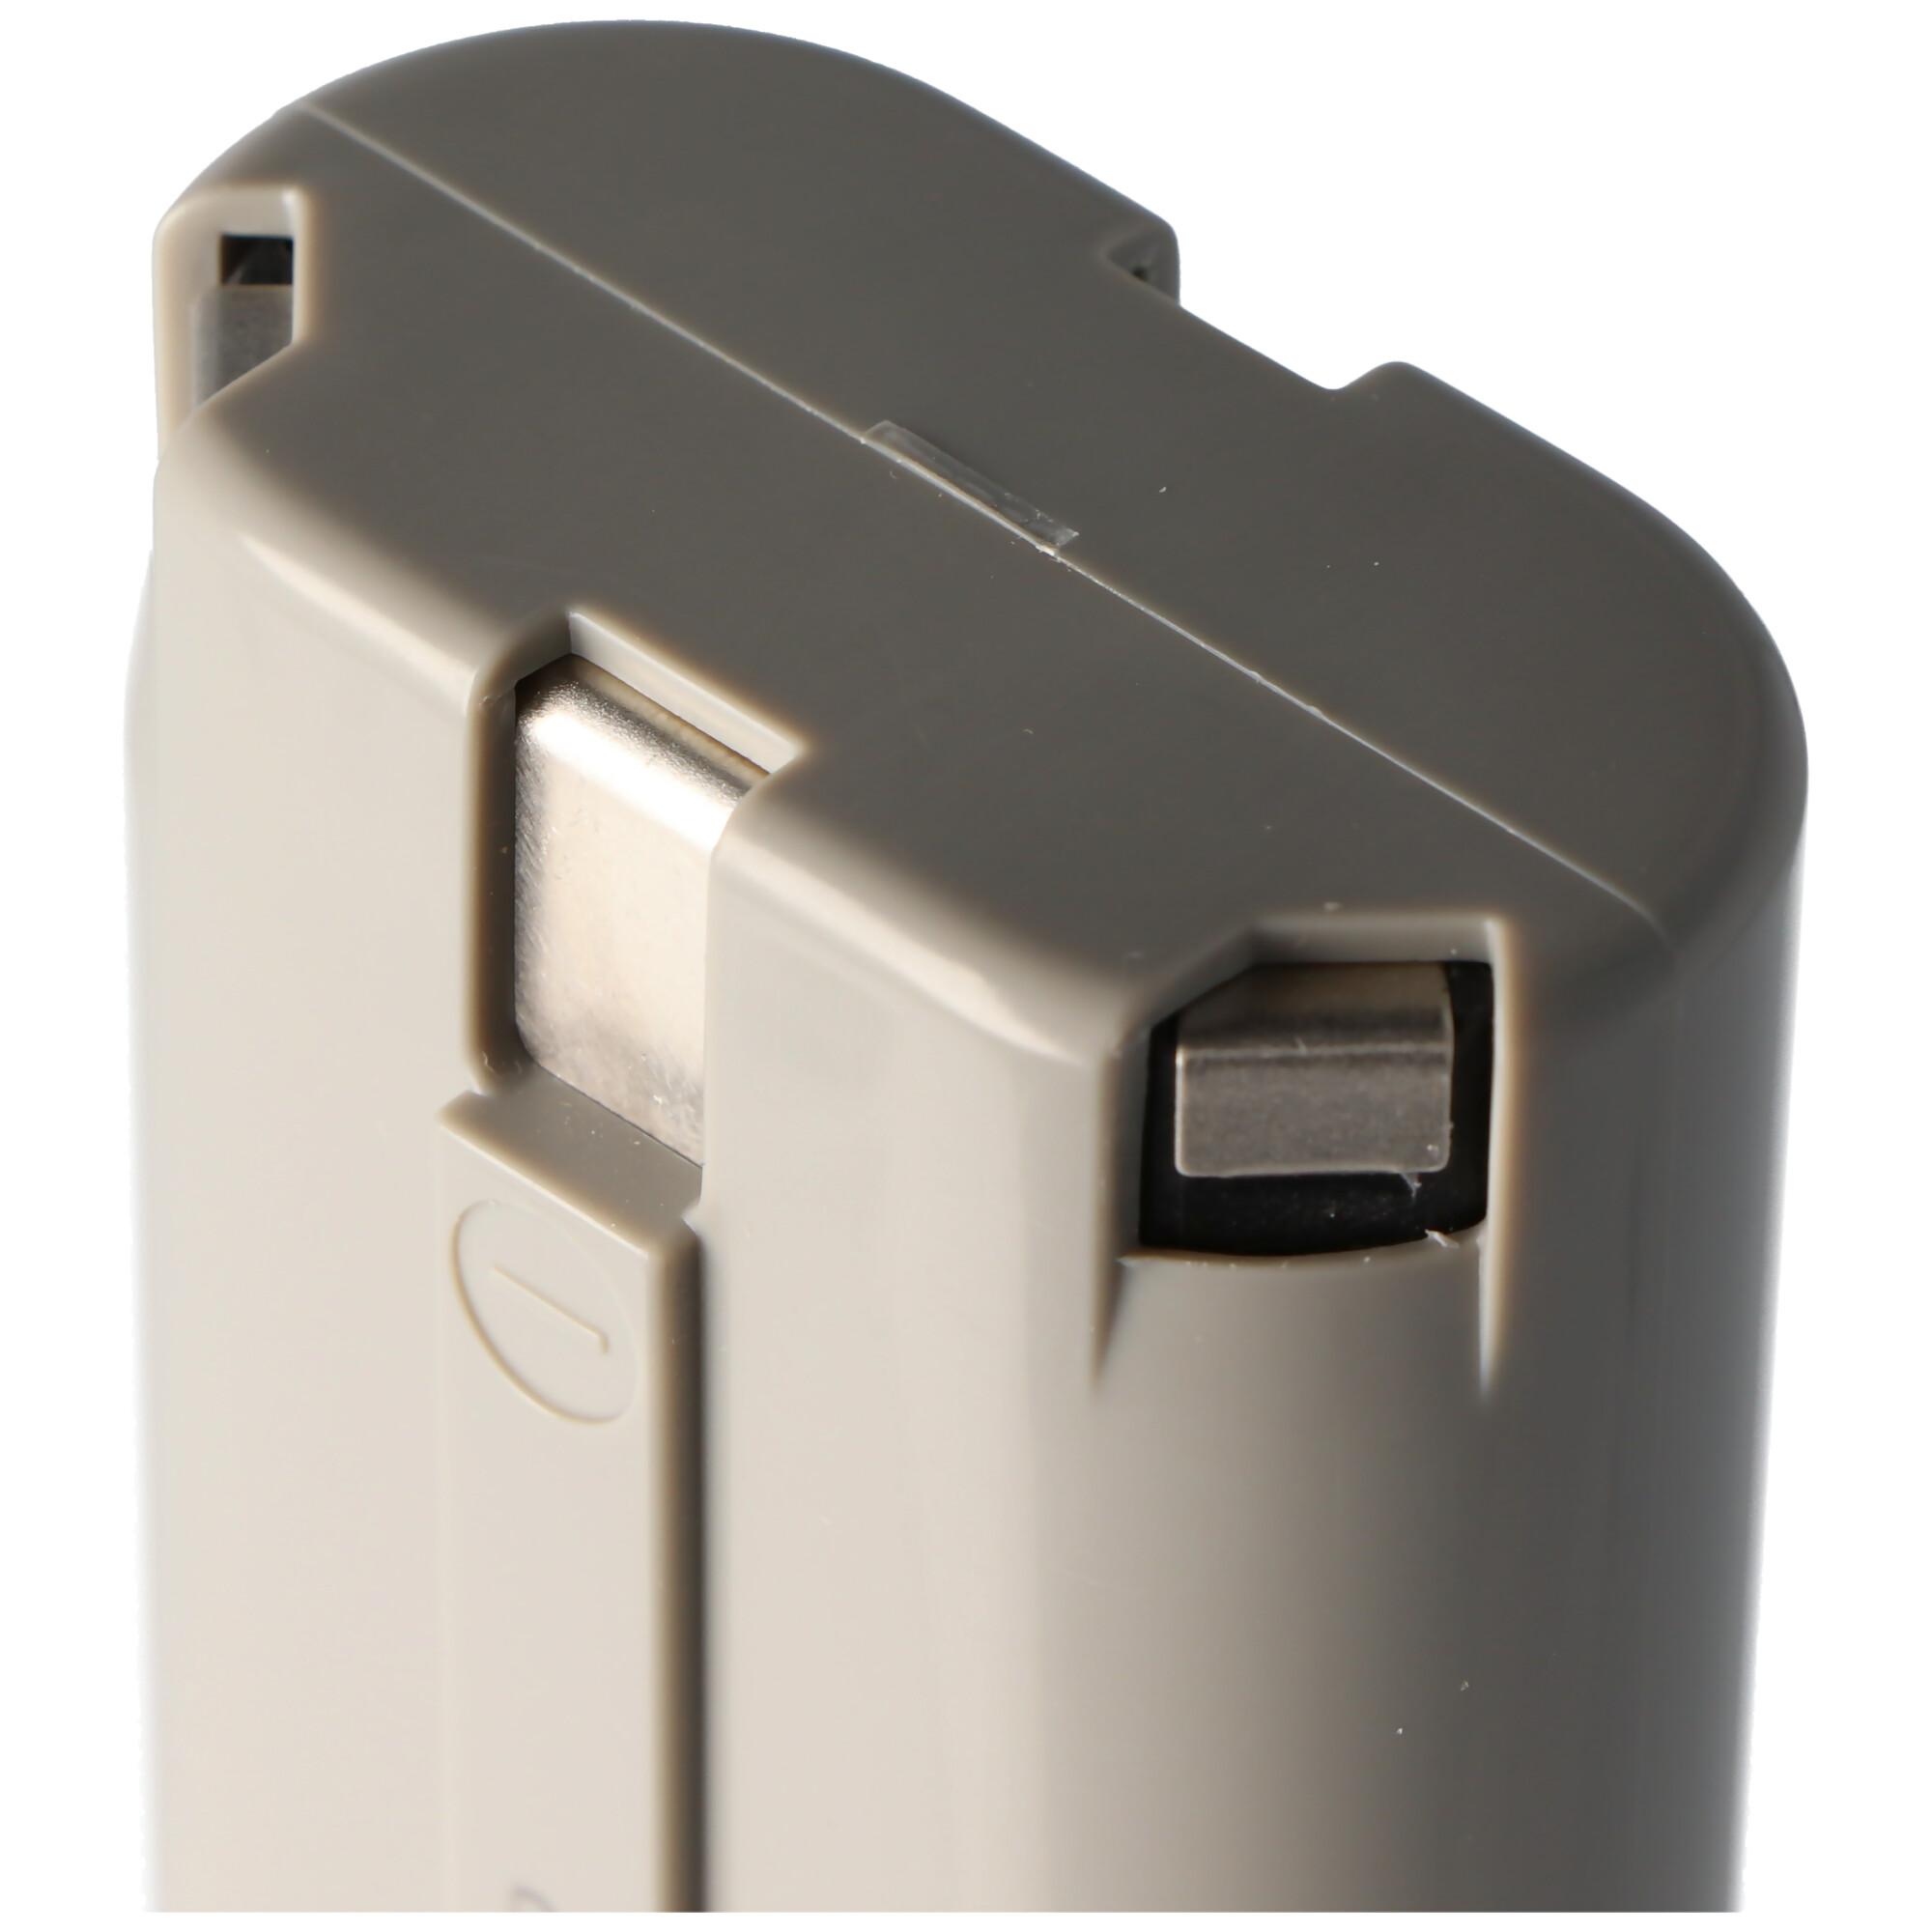 9.6 V 2.2ah Batterie pour Makita 4190 4390 6012 6093 6095 6891 séries